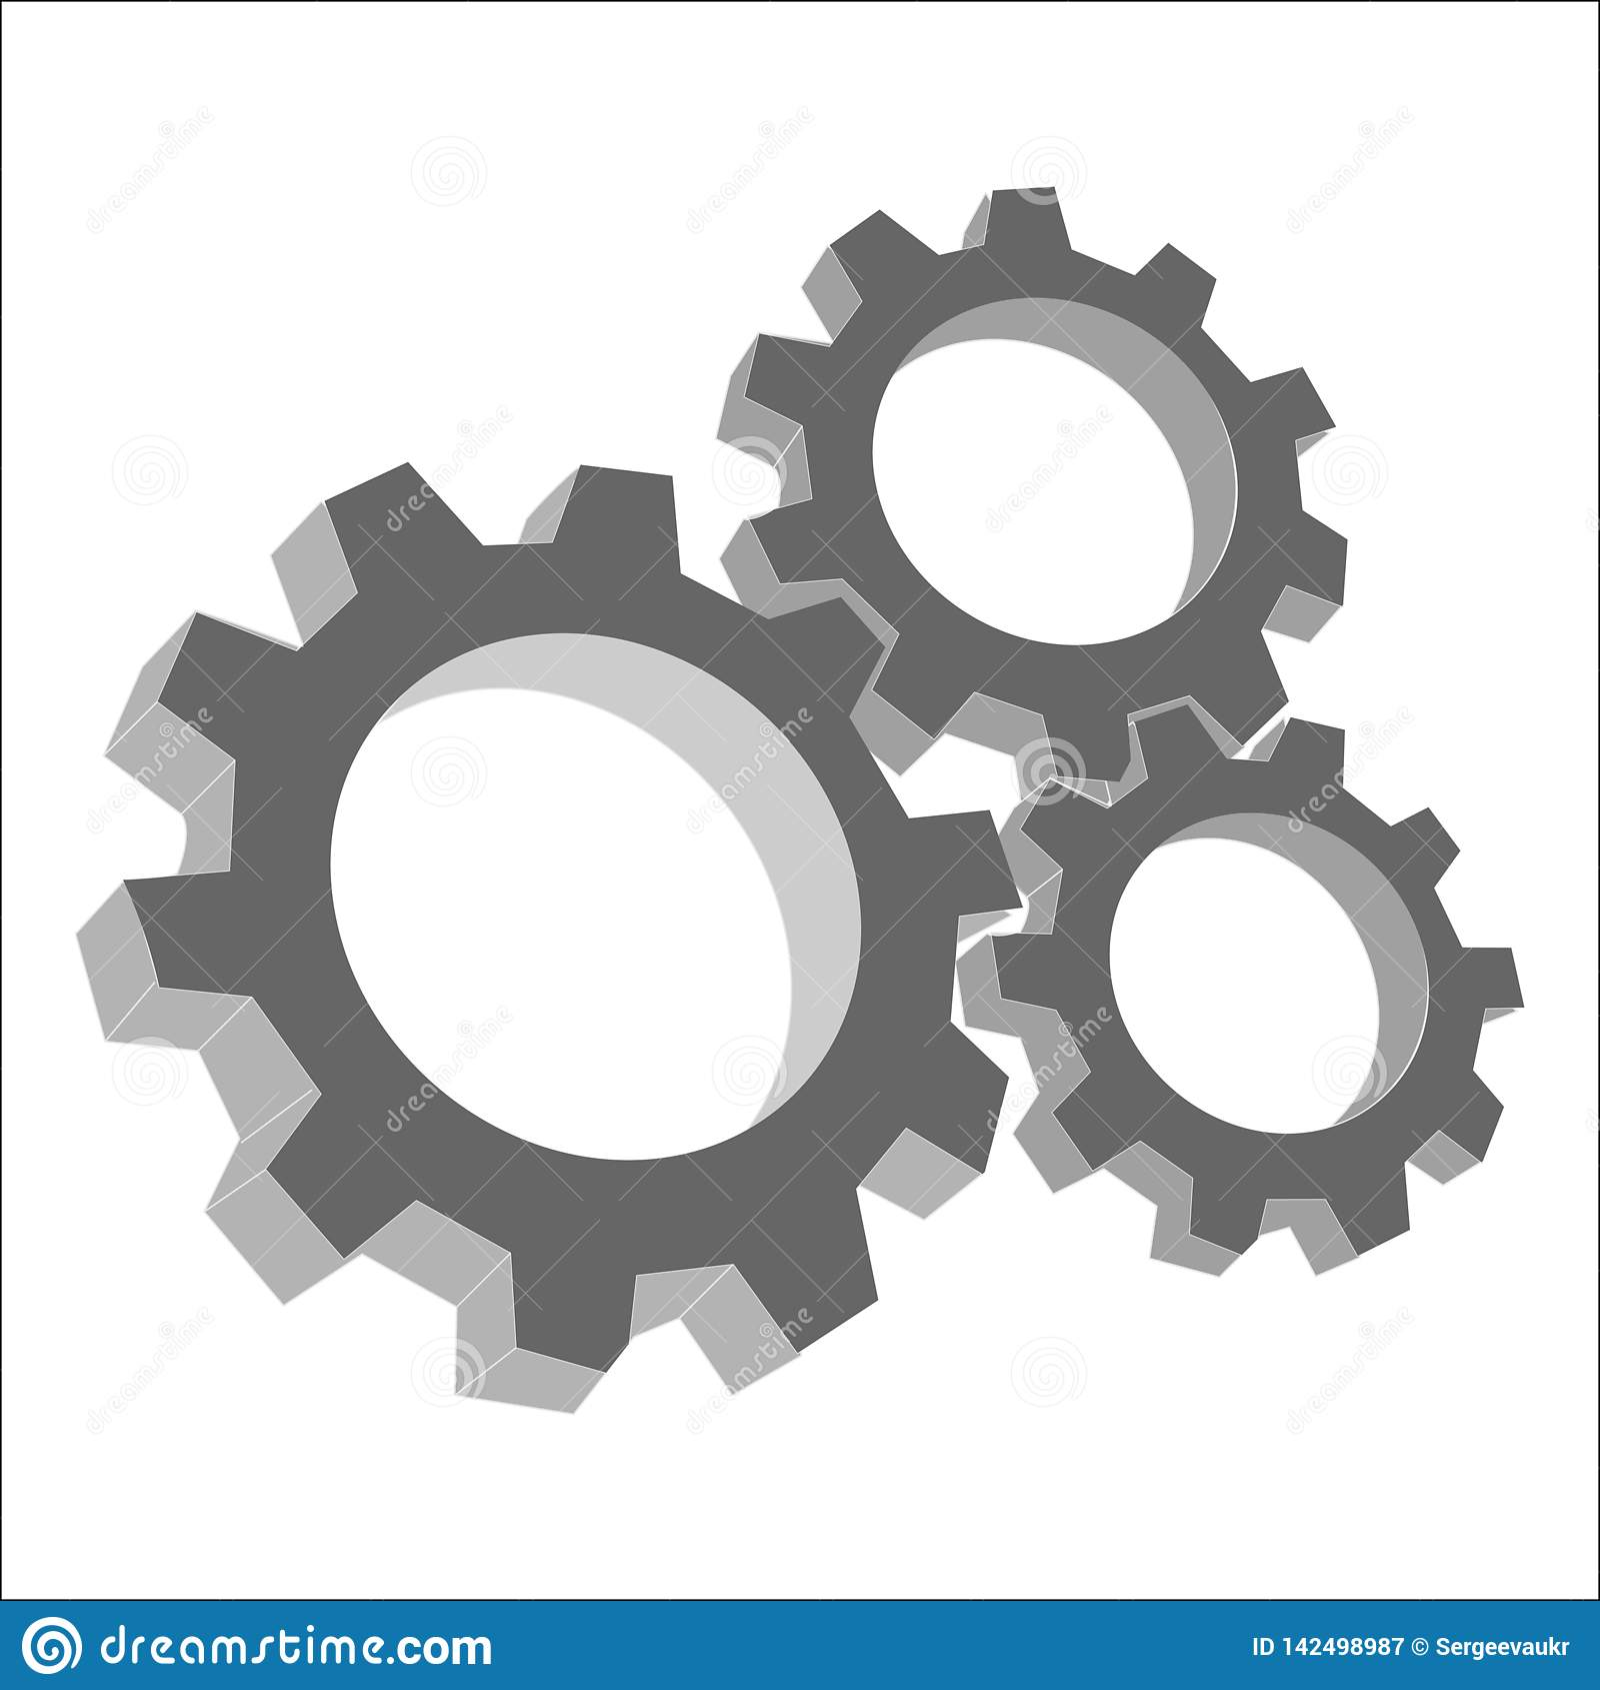 Vitesses, mécanisme, exactitude, vecteur abstrait, nheadline